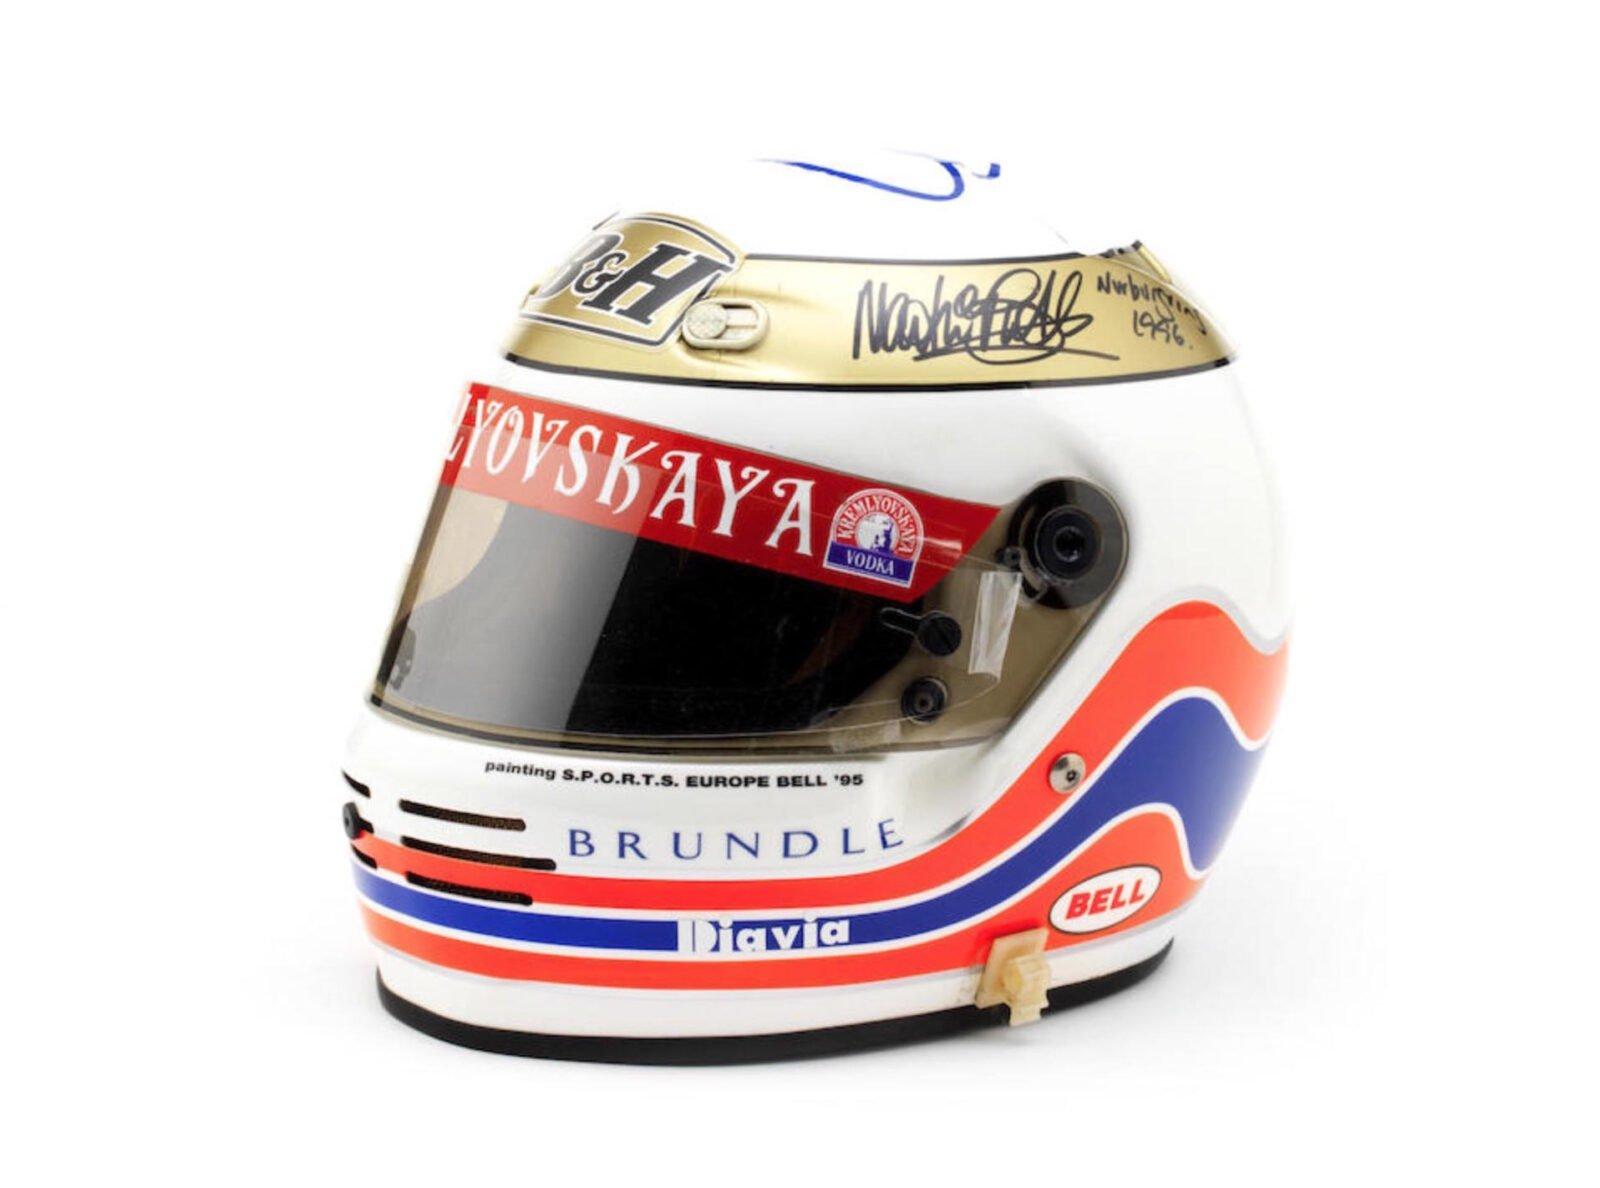 Martin Brundles 1995 Bell Formula 1 Helmet 1600x1188 - Martin Brundle's 1995 Bell Formula 1 Helmet